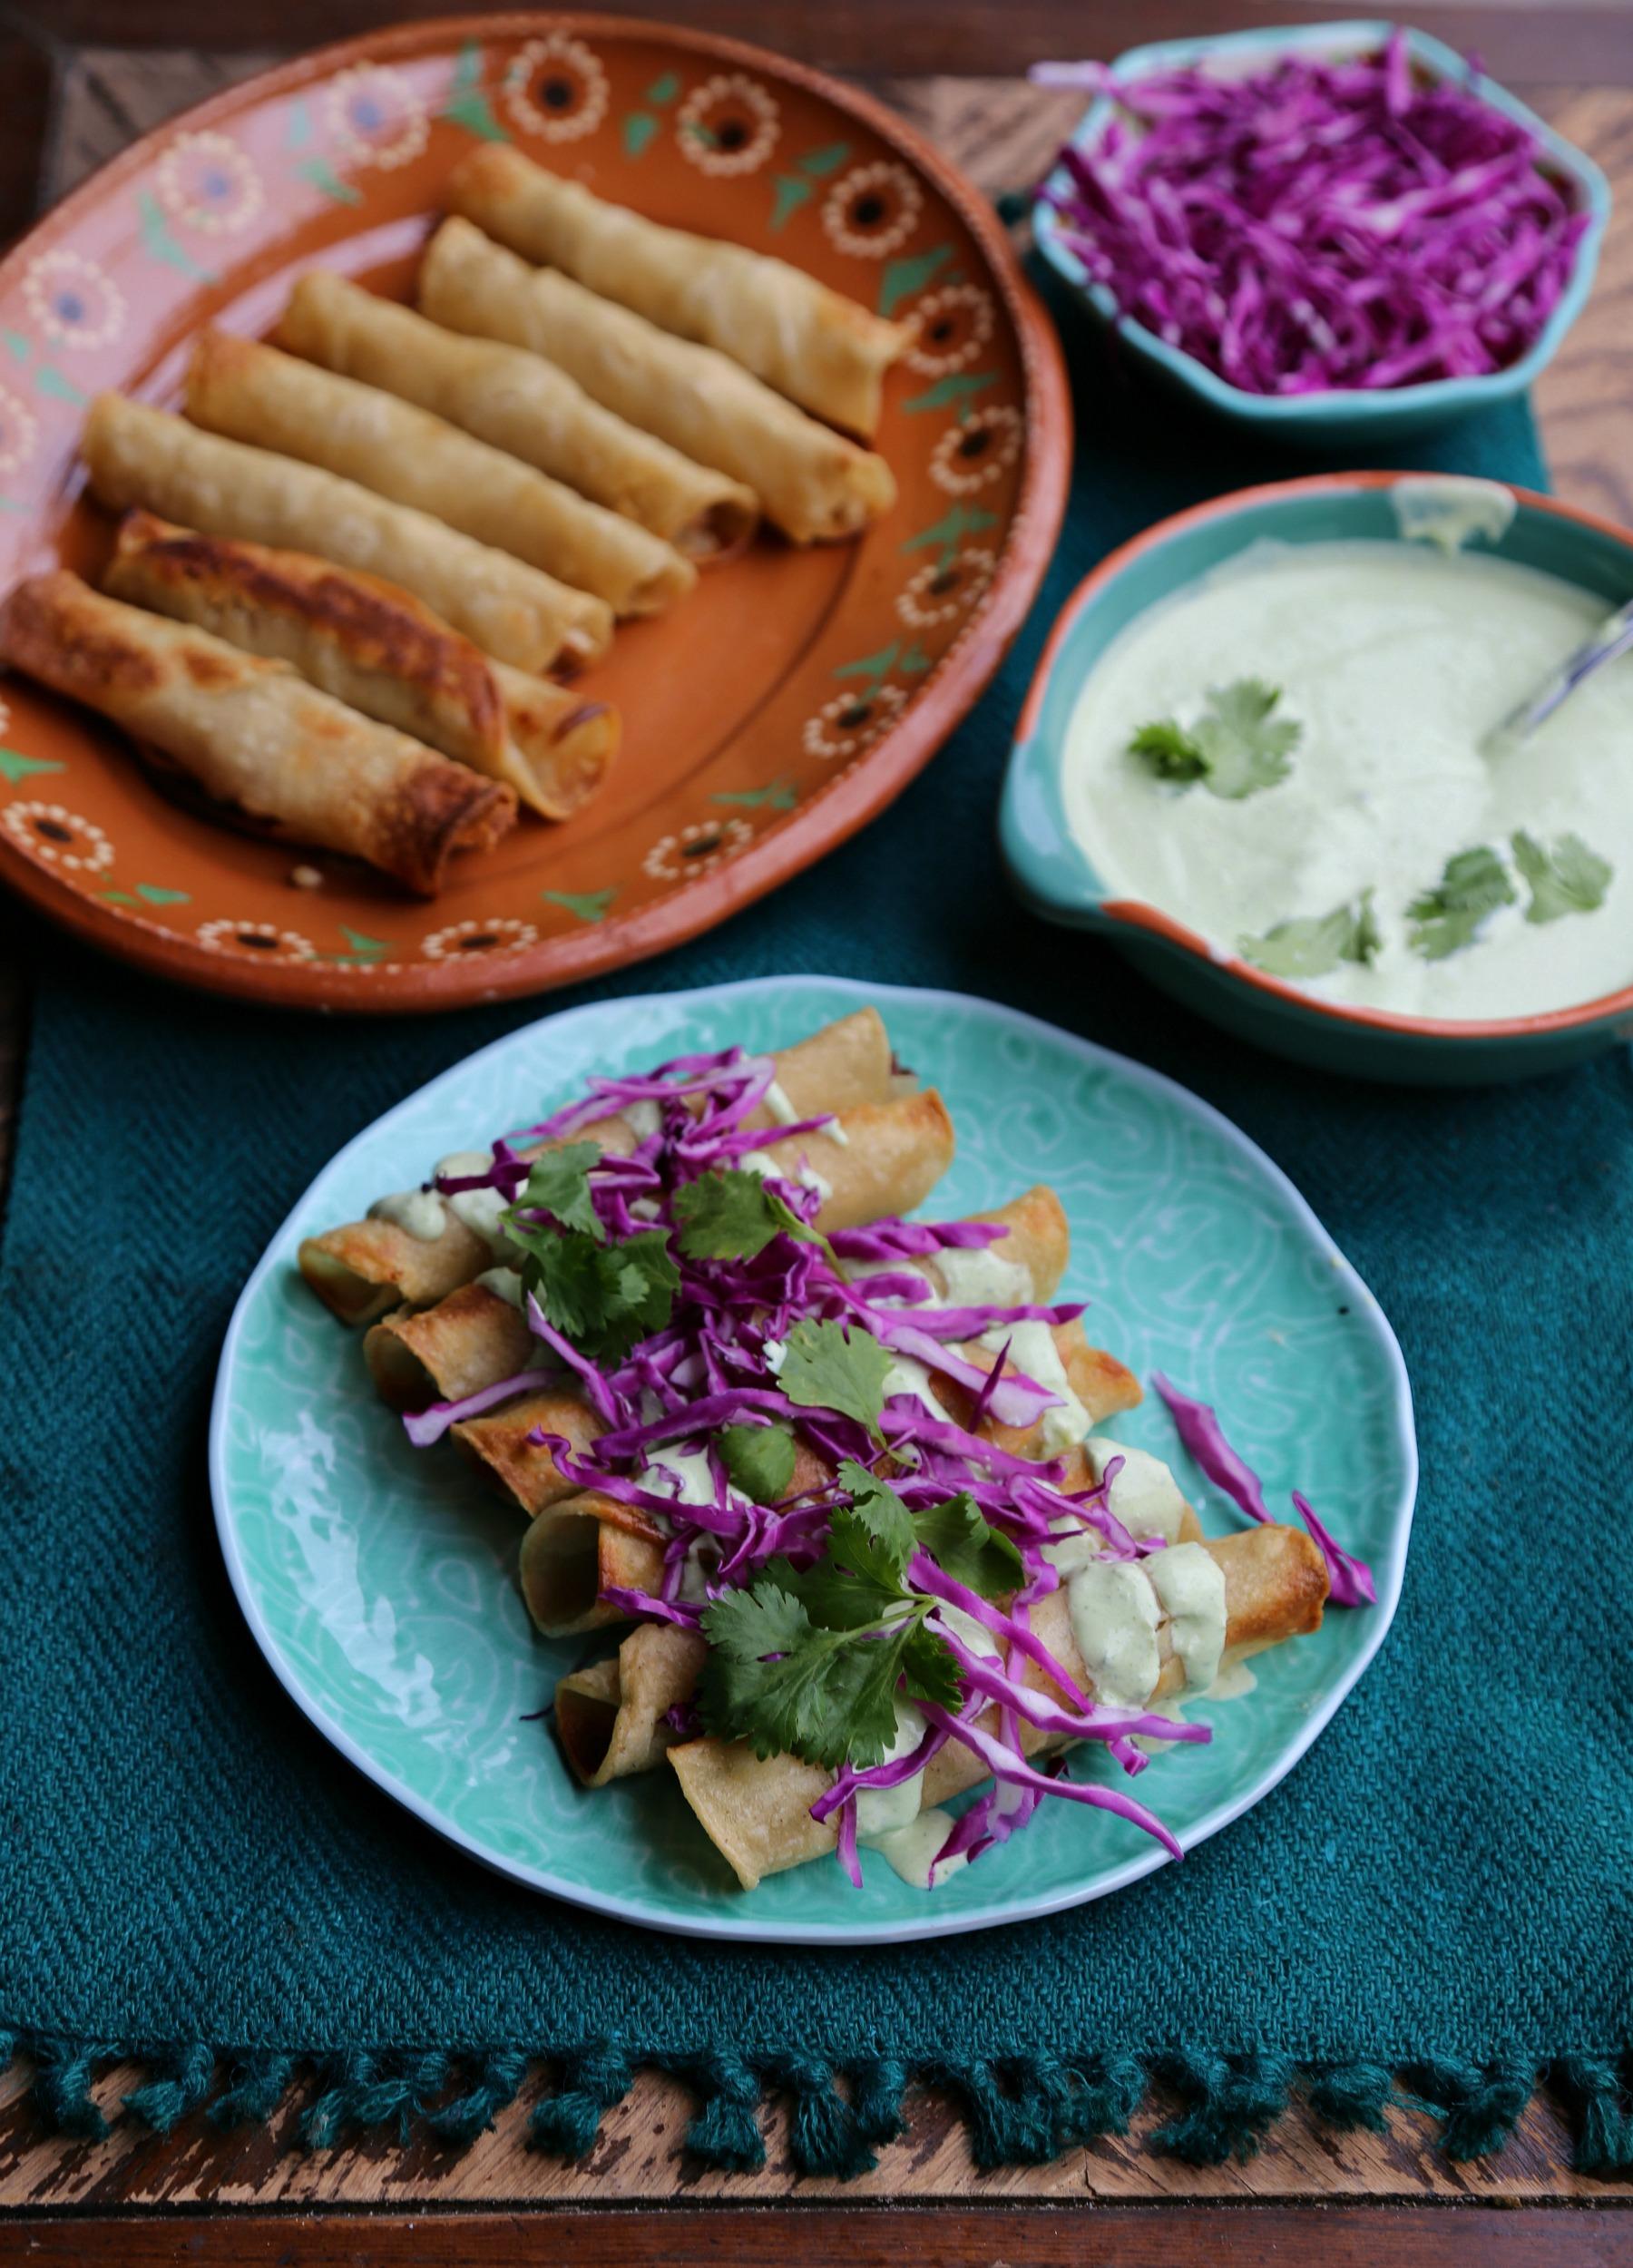 baked-chicken-taquitos-poblano-cream-sauce-vianneyrodriguez-sweetlifebake